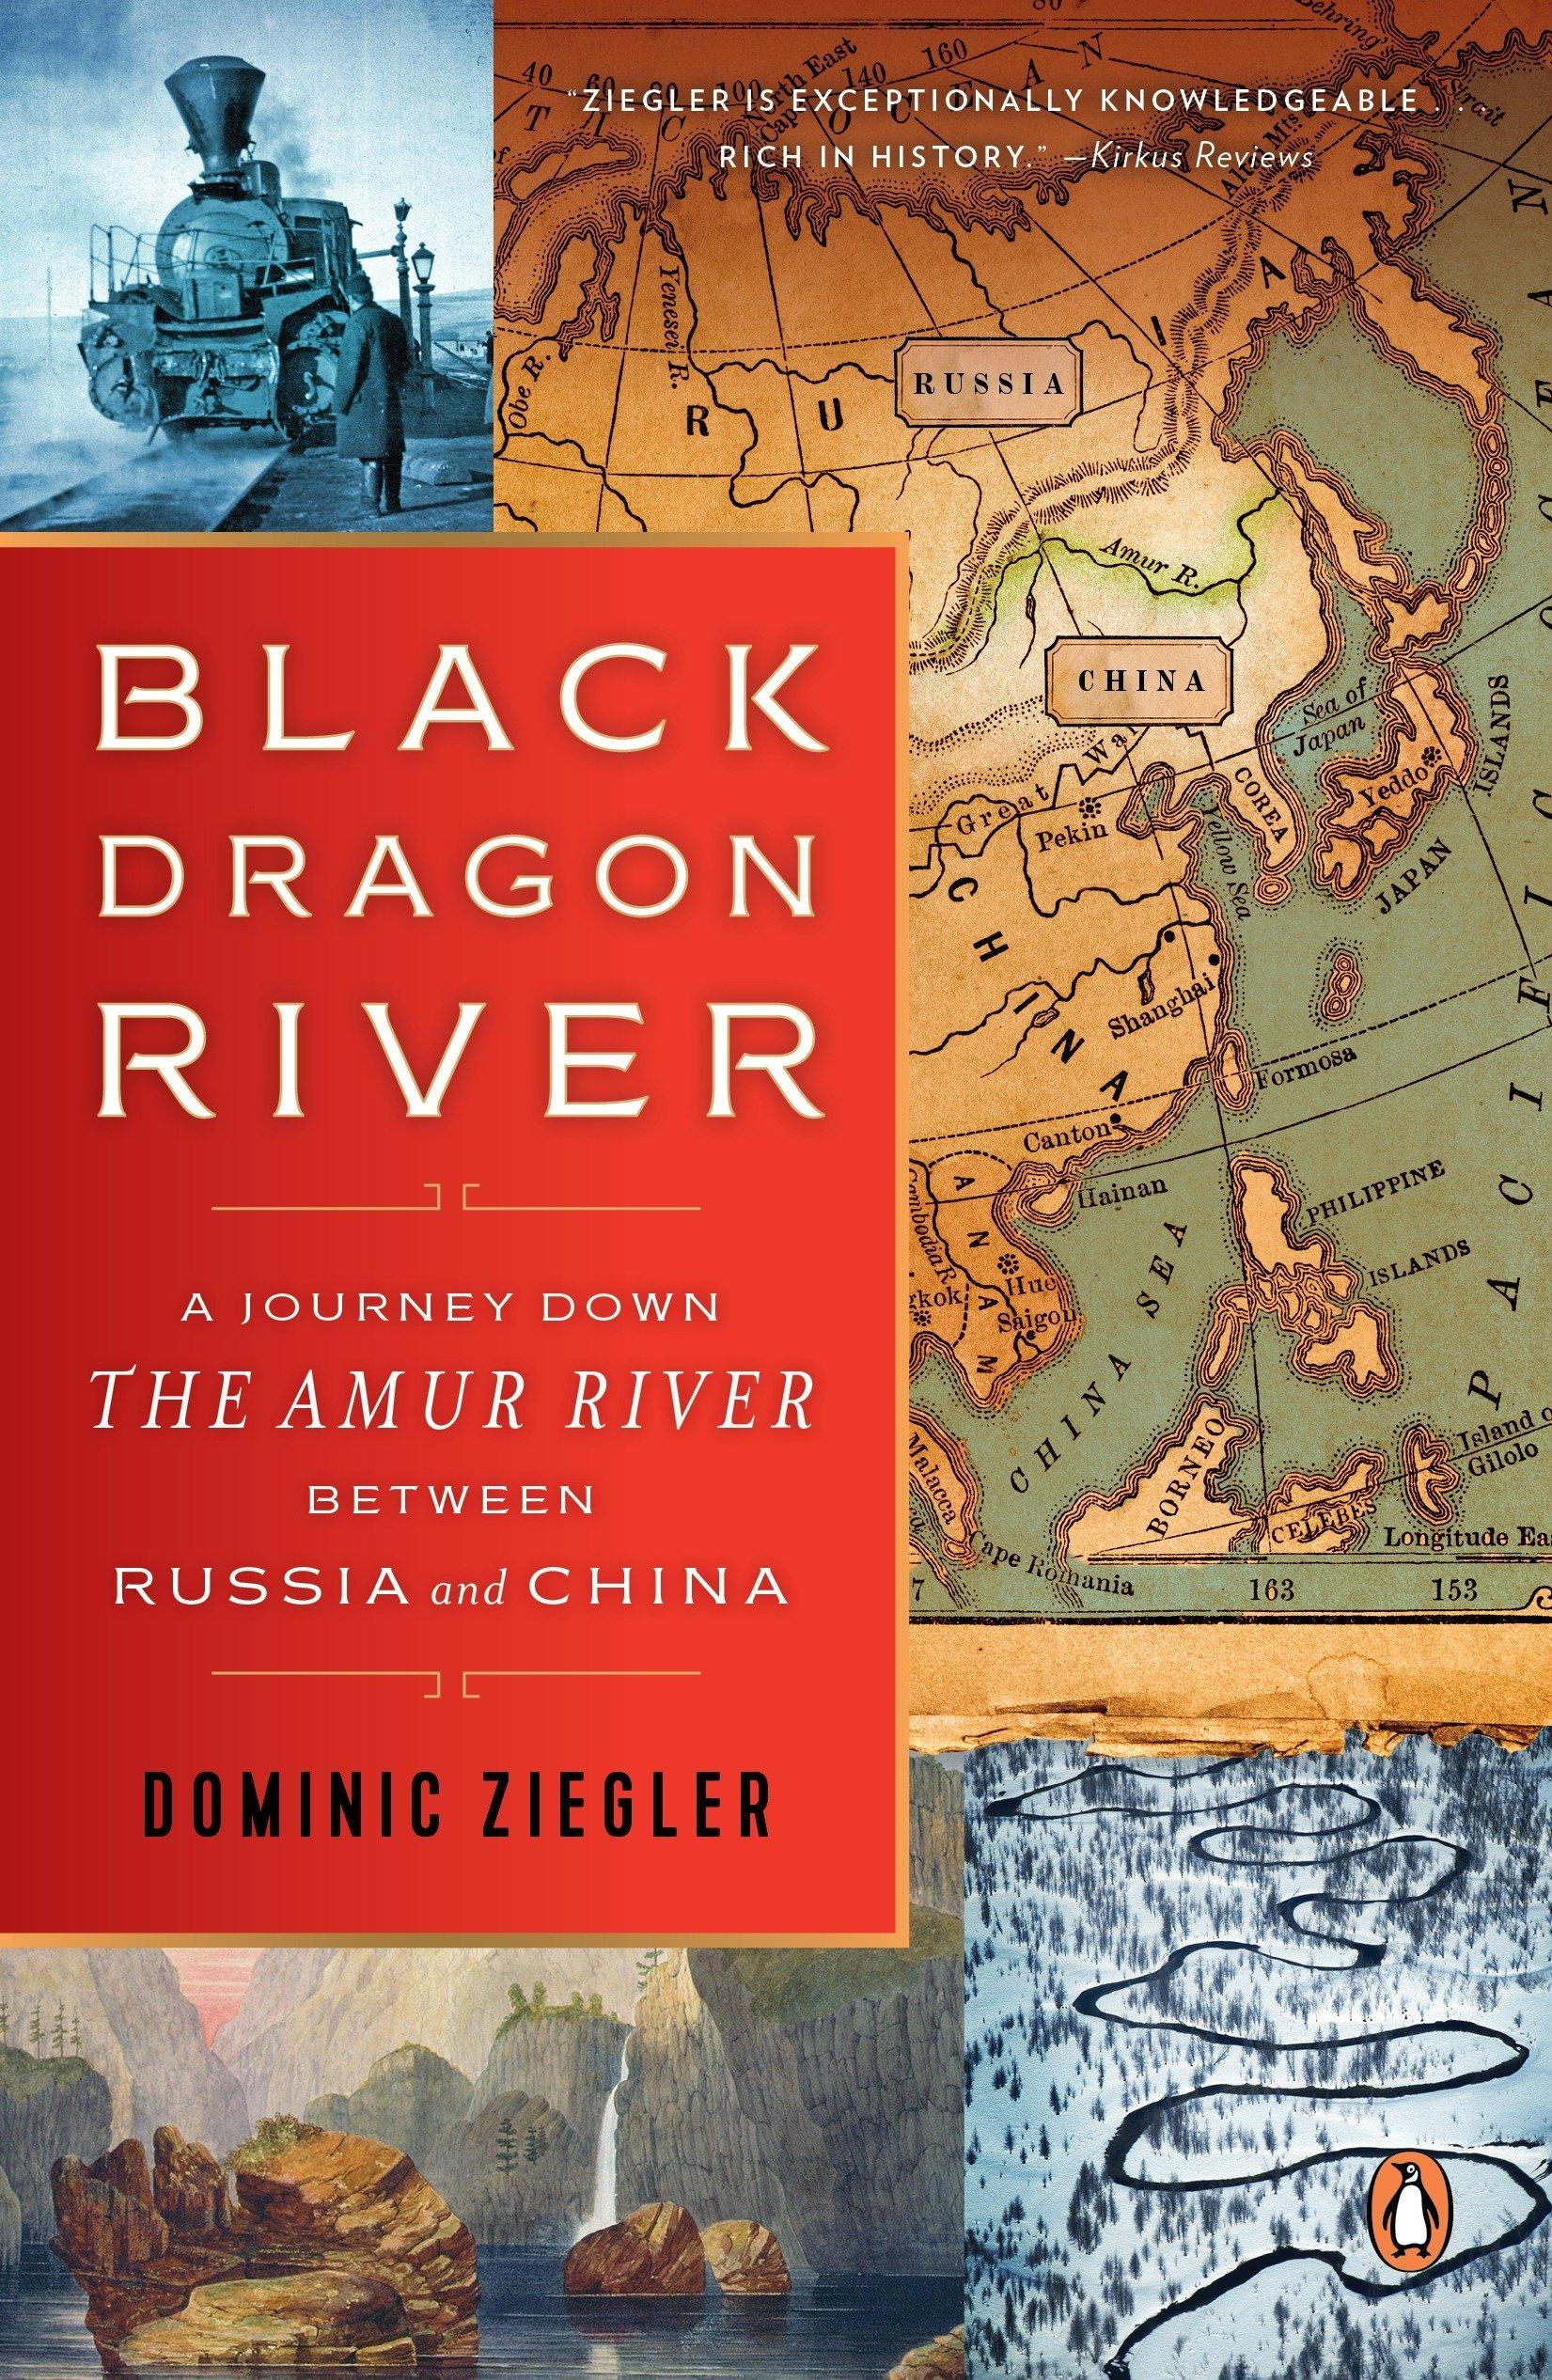 Black Dragon River: A Journey Down the Amur River Between ... on gobi desert map, brahmaputra river map, caspian sea map, indus river, ganges river map, euphrates river map, kamchatka peninsula map, lake baikal, lena river, kuril islands, ganges river, amu darya, yellow river, moscow map, ob river, irrawaddy river map, mackenzie river, danube map, yalu river, yangtze river, mekong map, yenisei river map, aral sea map, yangtze river map, himalayas map, bering sea map, yenisei river, don river map, xi jiang river map, chang jiang river map, russia map, amu darya river map, ural river, kamchatka peninsula, brahmaputra river,